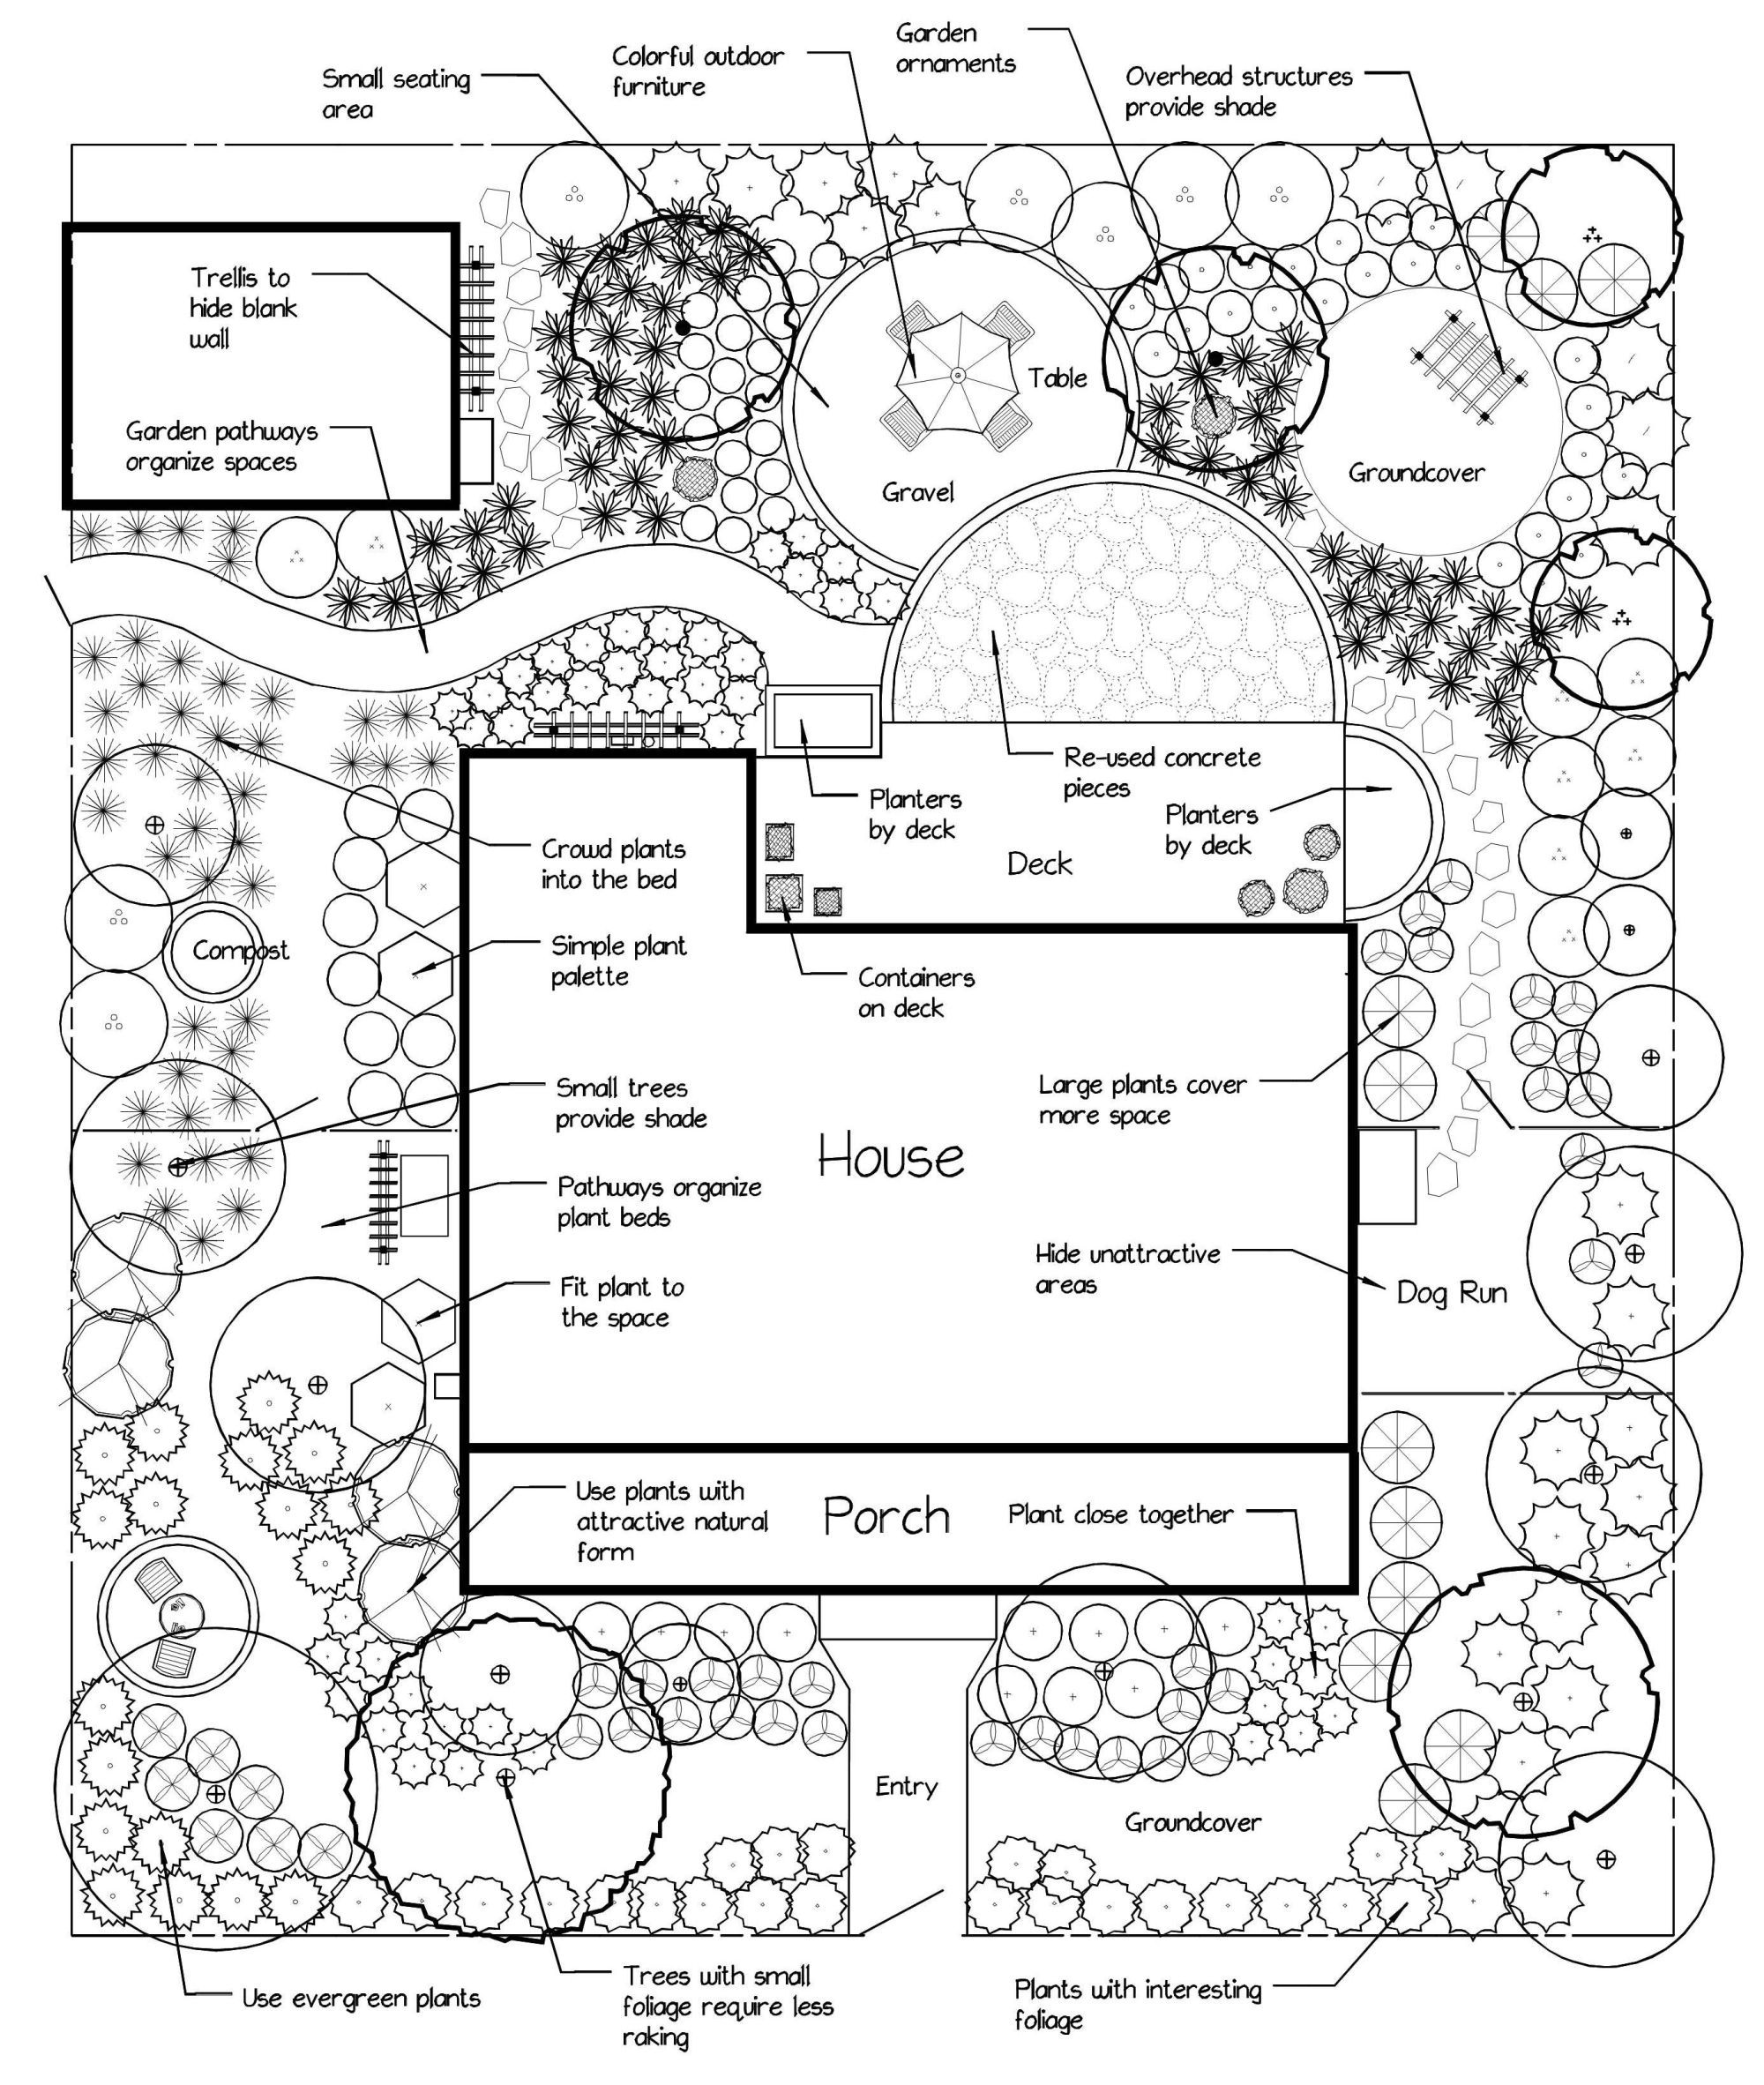 Garden Design Vacancies twenty-two ideas for a low-care, low-cost landscape -- figure 21